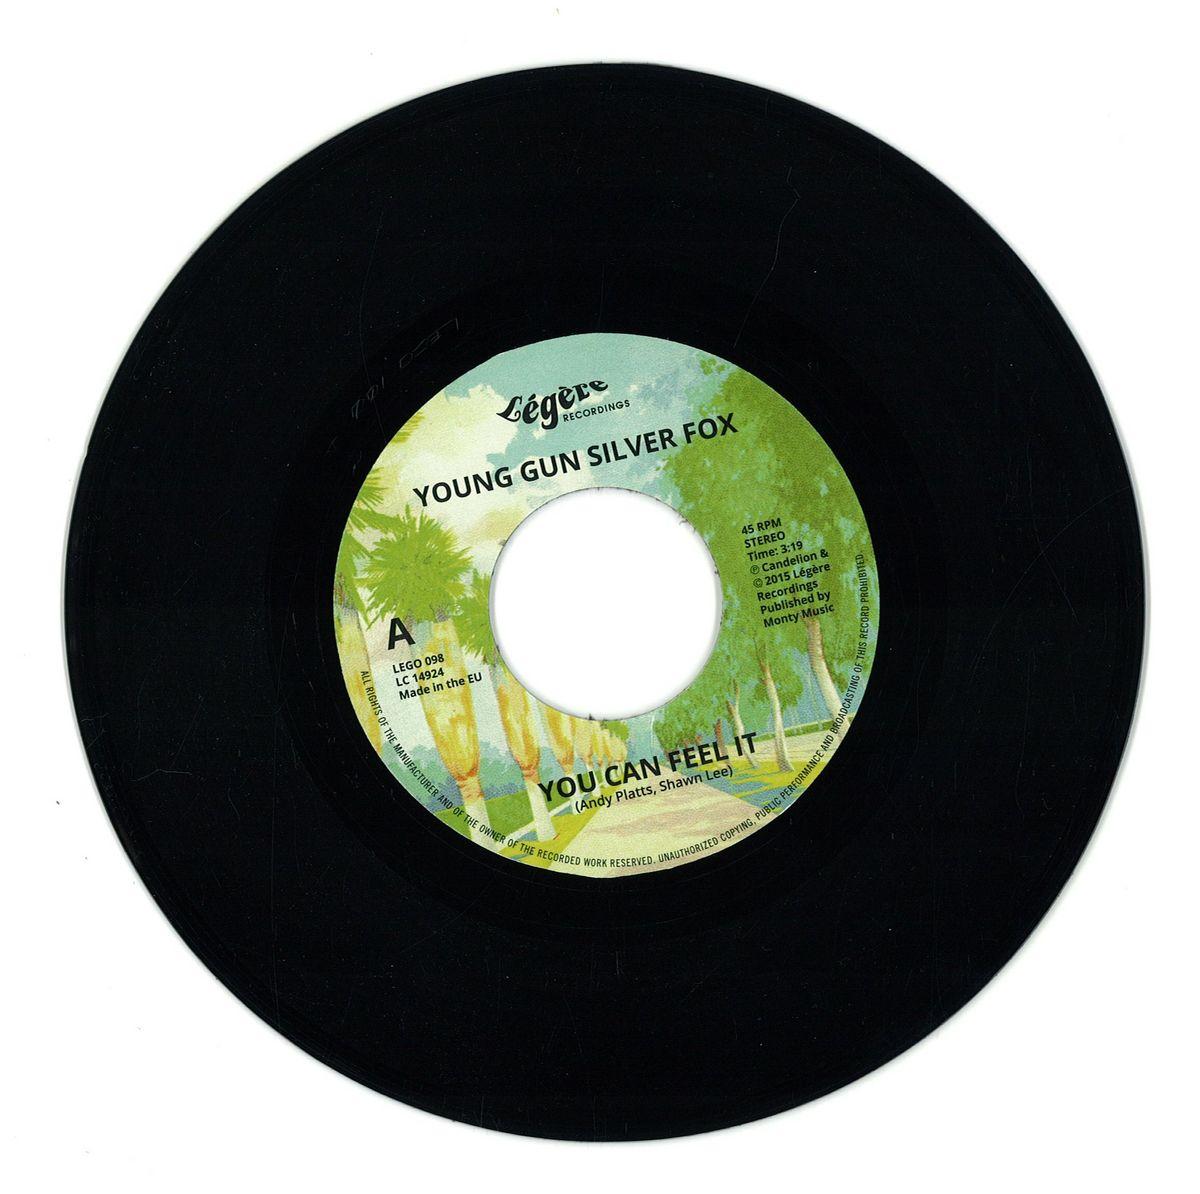 Young Gun Silver Fox   You Can Feel It / LEGERE RECORDINGS LEGO100   Vinyl